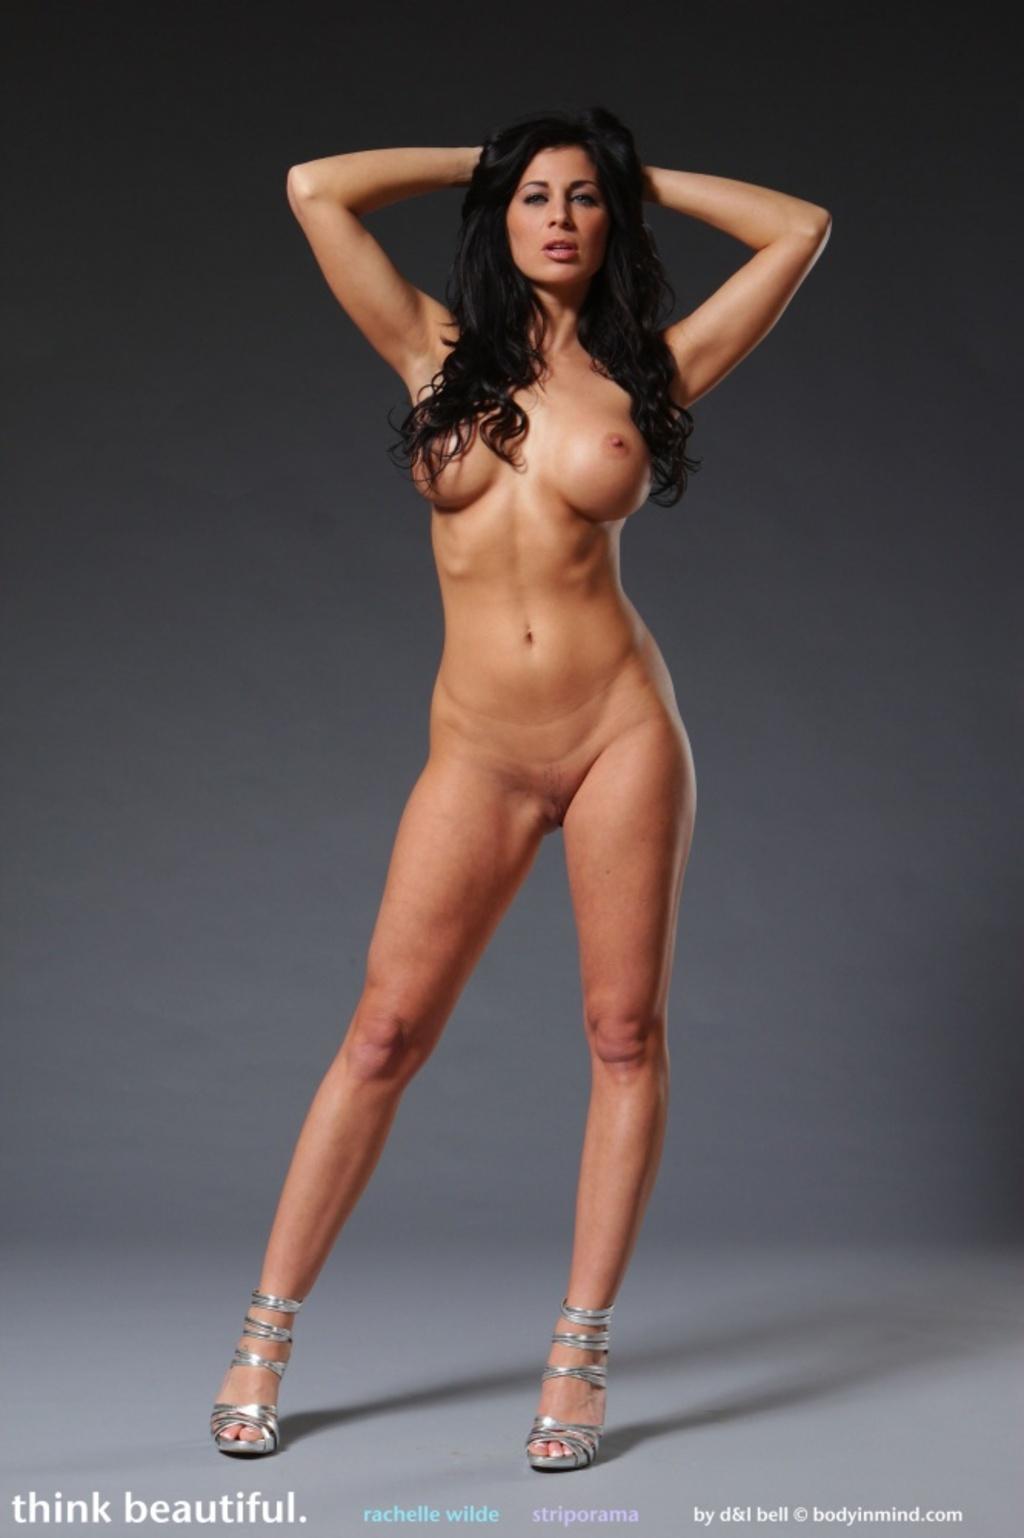 Rachel priest sex 3gp pornos download